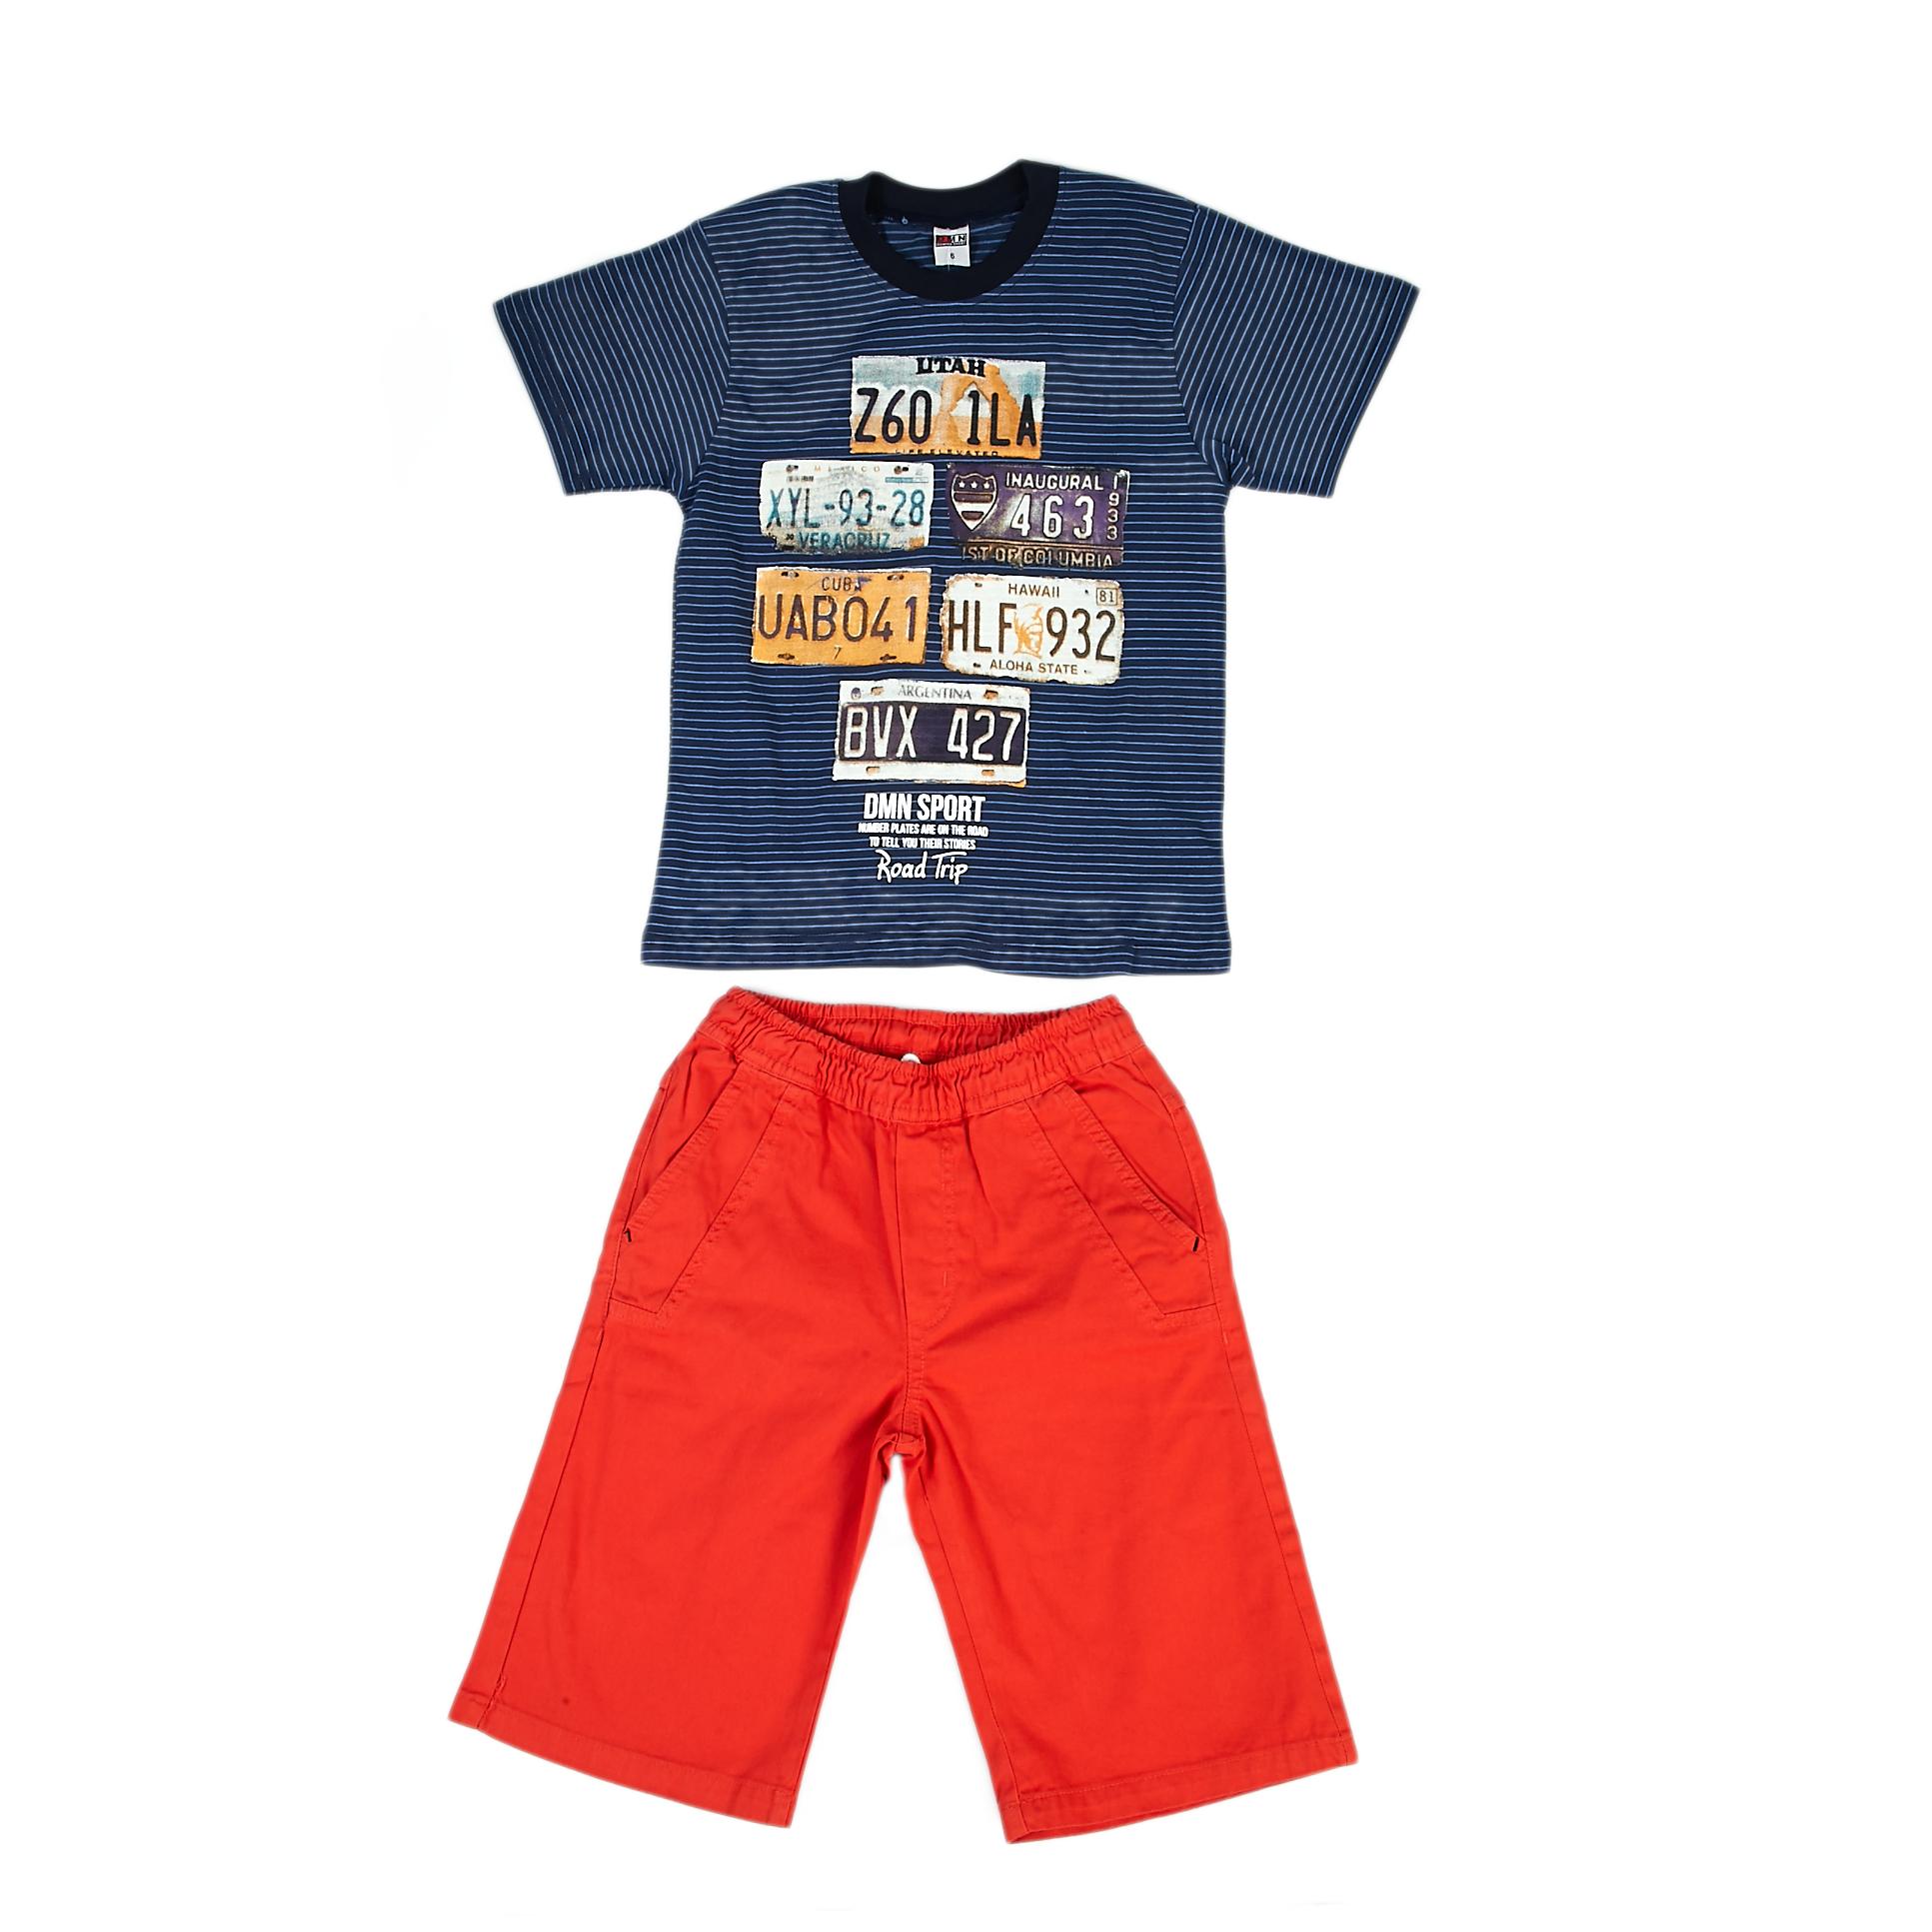 3e9aa3534be JUICY COUTURE KIDS – Παιδικό παντελόνι Juicy Couture μπλε. 34,90 € στο Factory  Outlet Περισσότερα ». -40% DMN – Παιδικό σετ DMN μπλε-κόκκινο